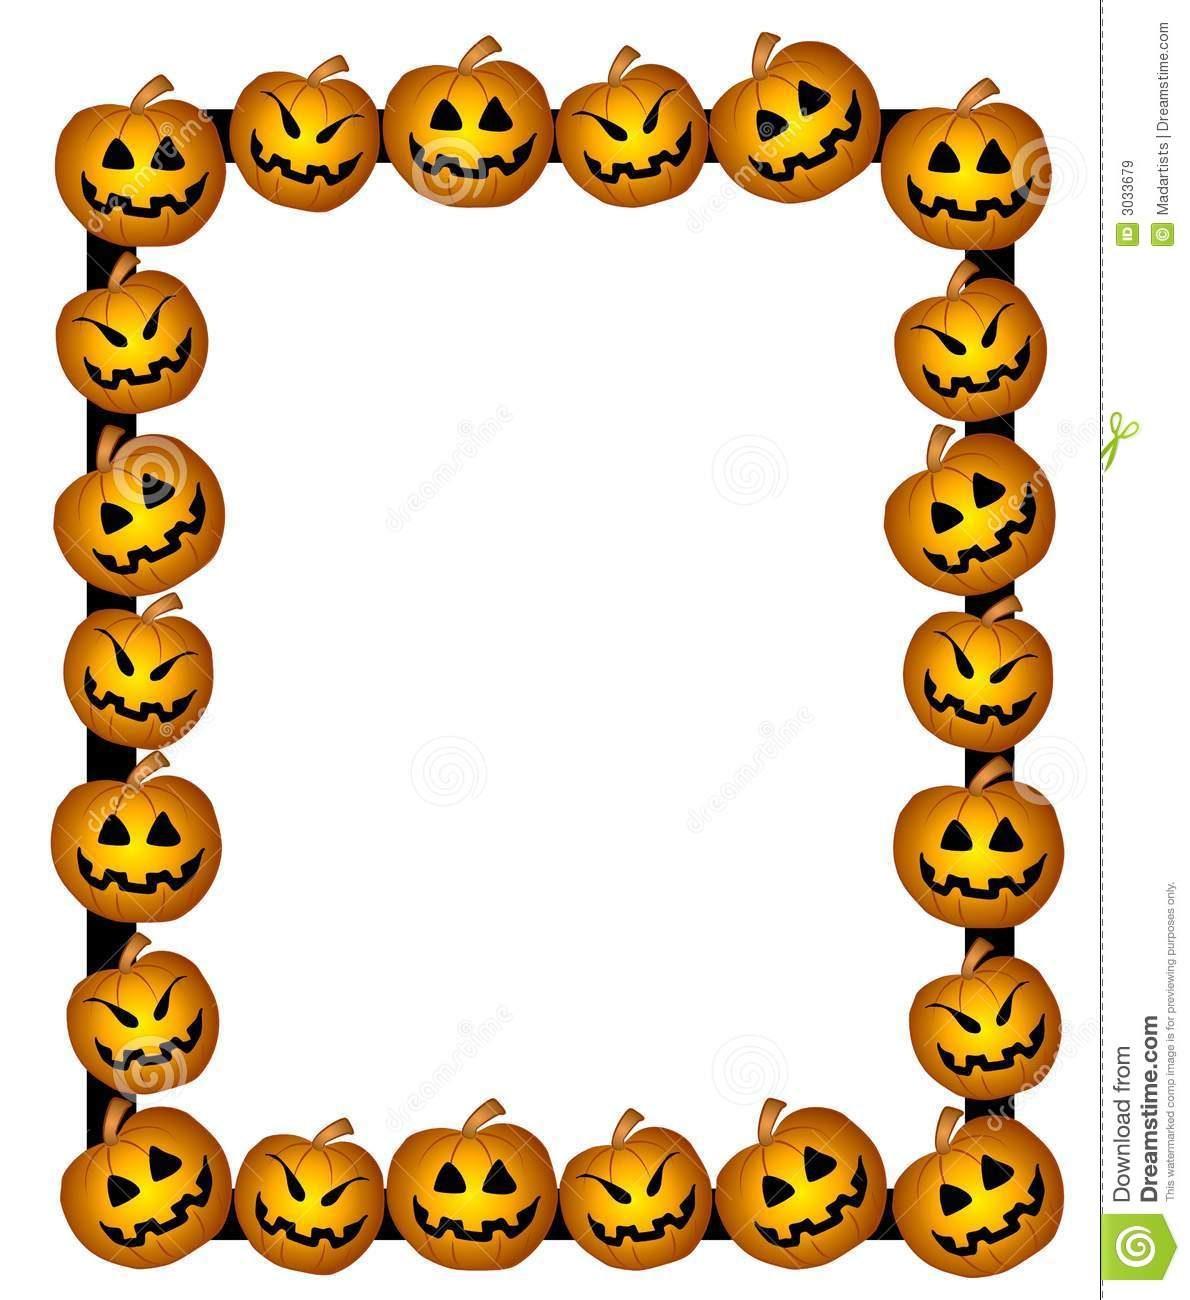 Pumpkin border cyberuse clip. Boarder clipart cute